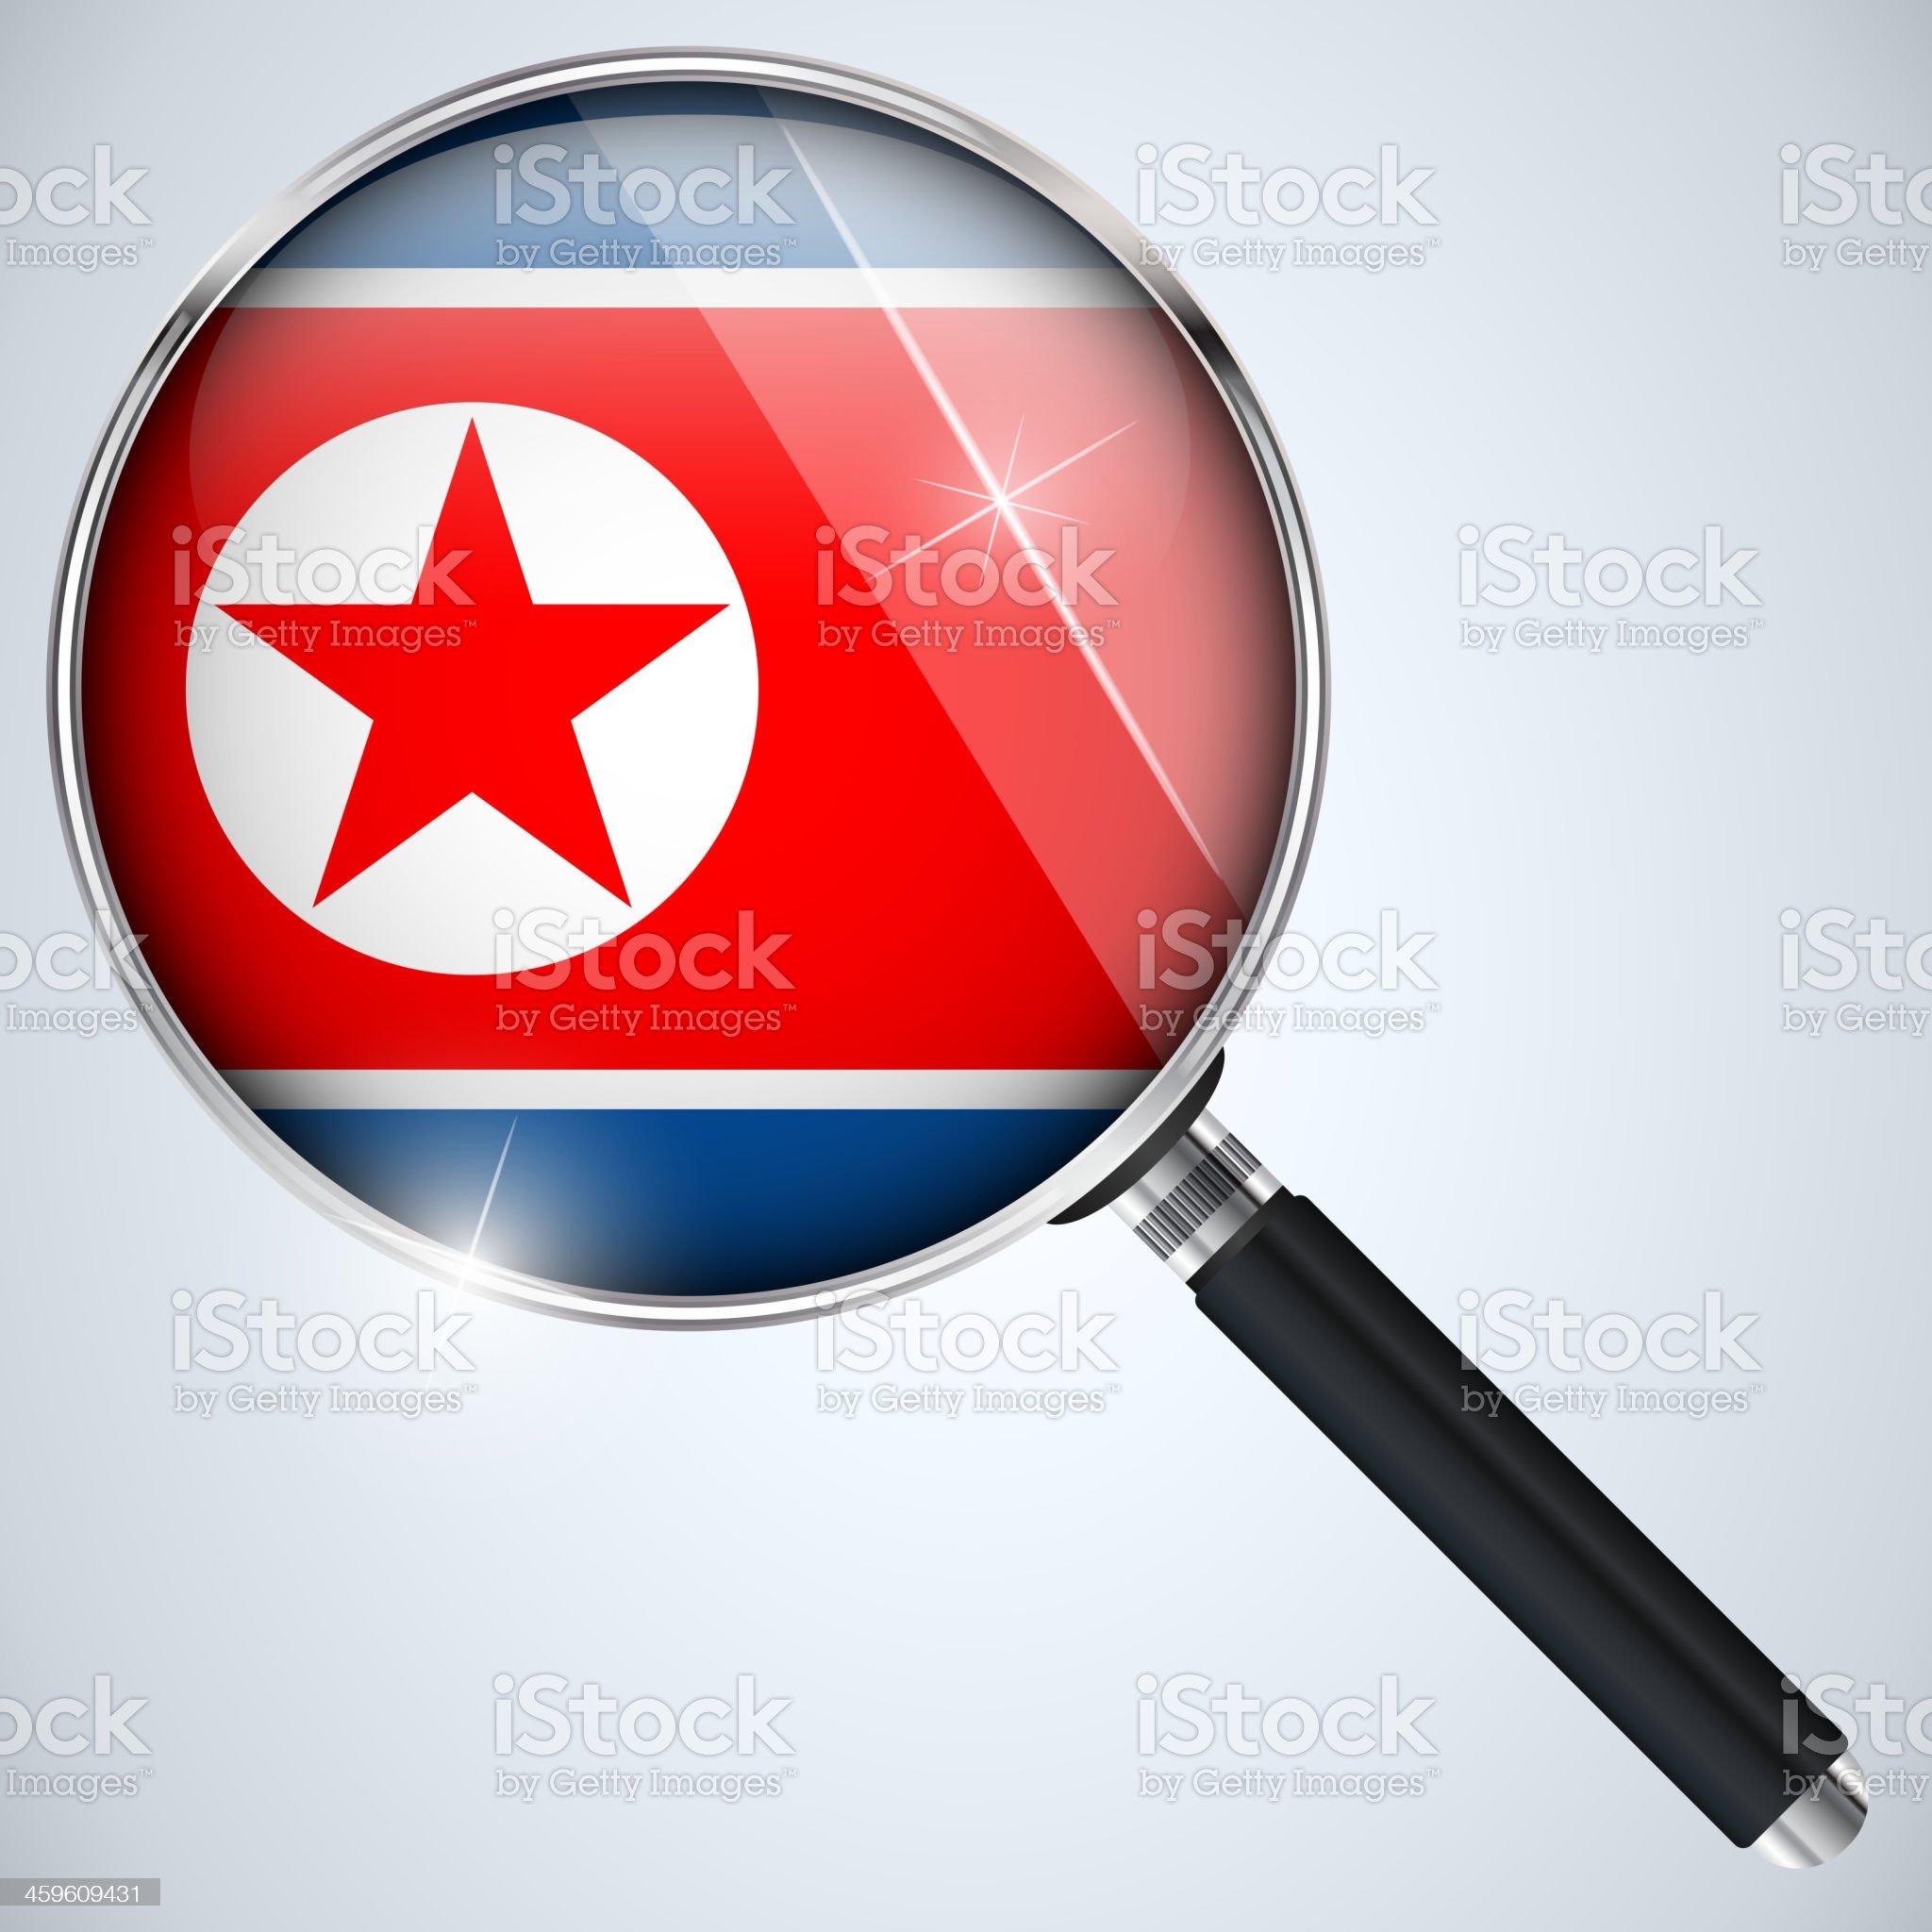 NSA USA Government Spy Program Country North Korea royalty-free stock vector art